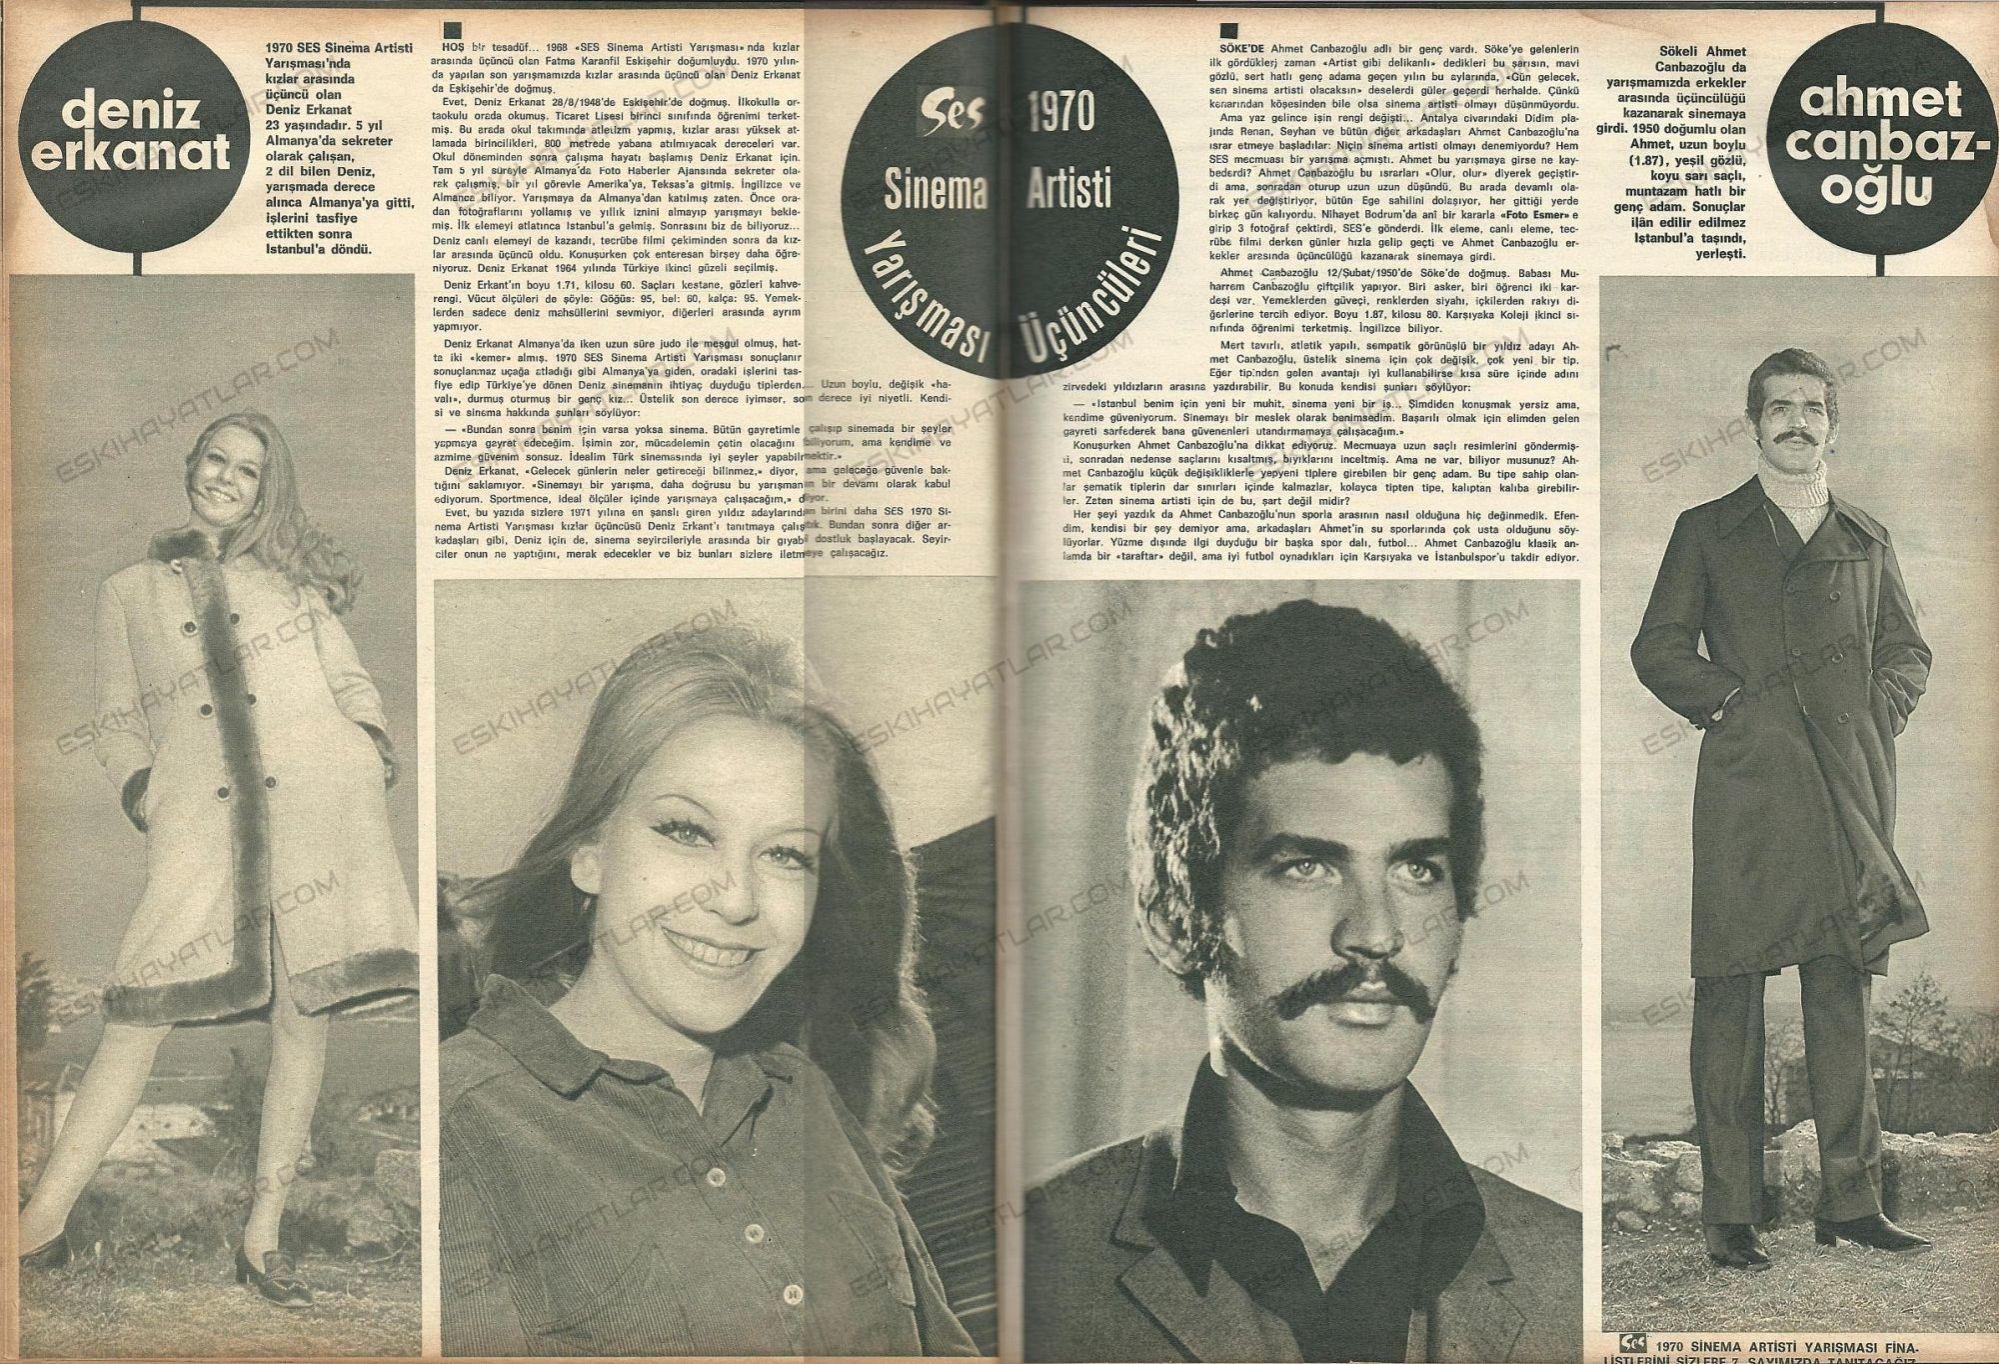 ses-dergisi-1971-sinema-artisti-yarismasi-deniz-erkanat-ahmet-canbazoglu (1)